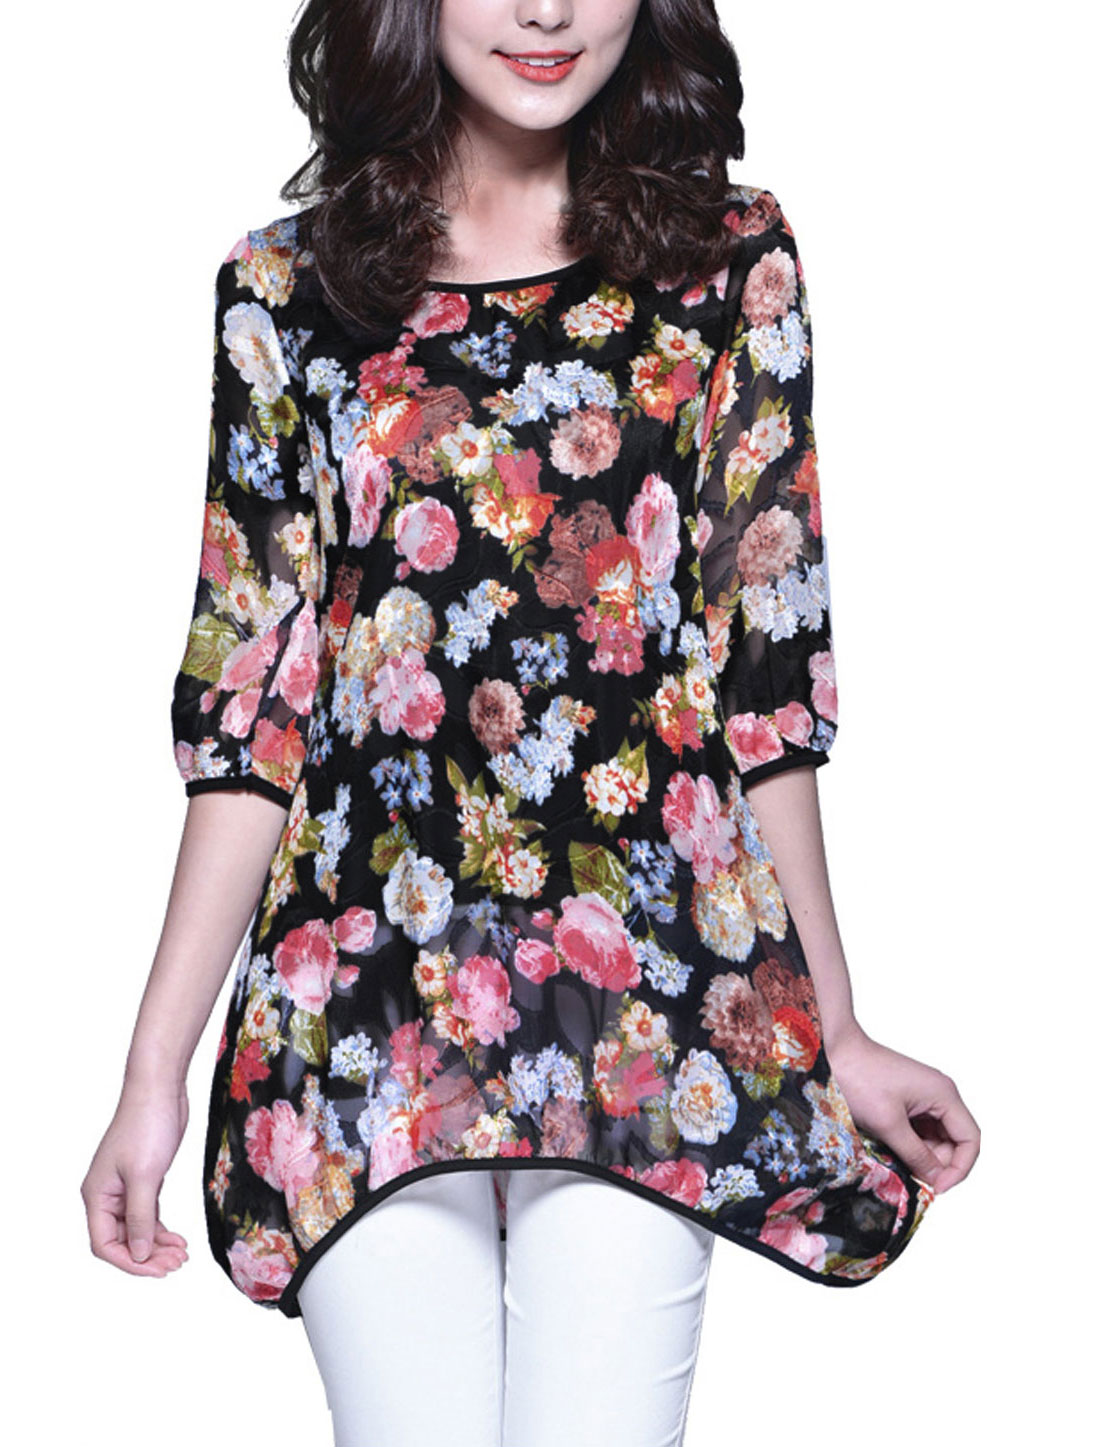 Lady Floral Prints Round Neck 3/4 Sleeve Slipover Tunic Blouse w Waist Strap Black M